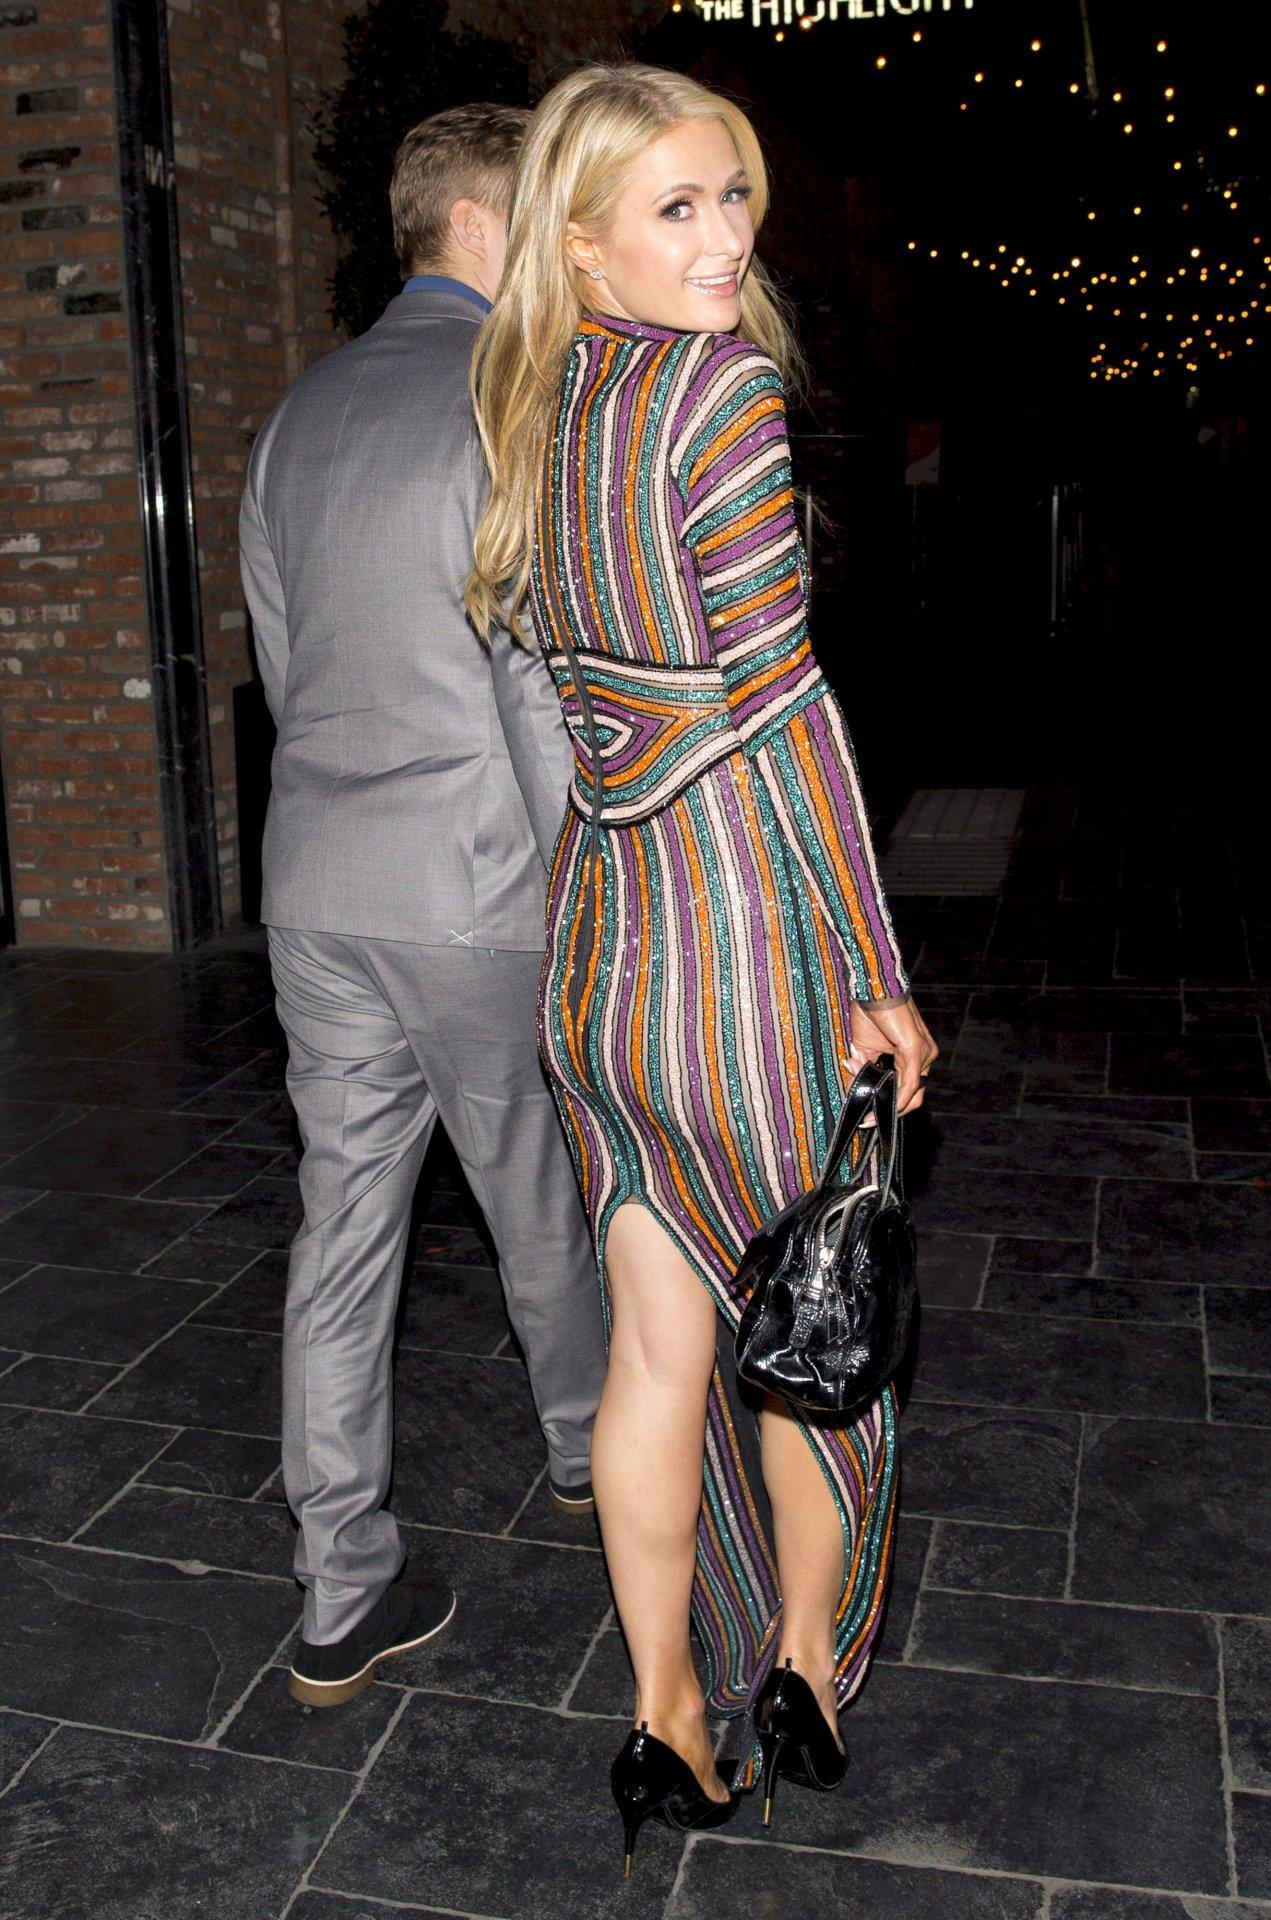 Paris Hilton - Braless See-Through Candids in Los Angeles